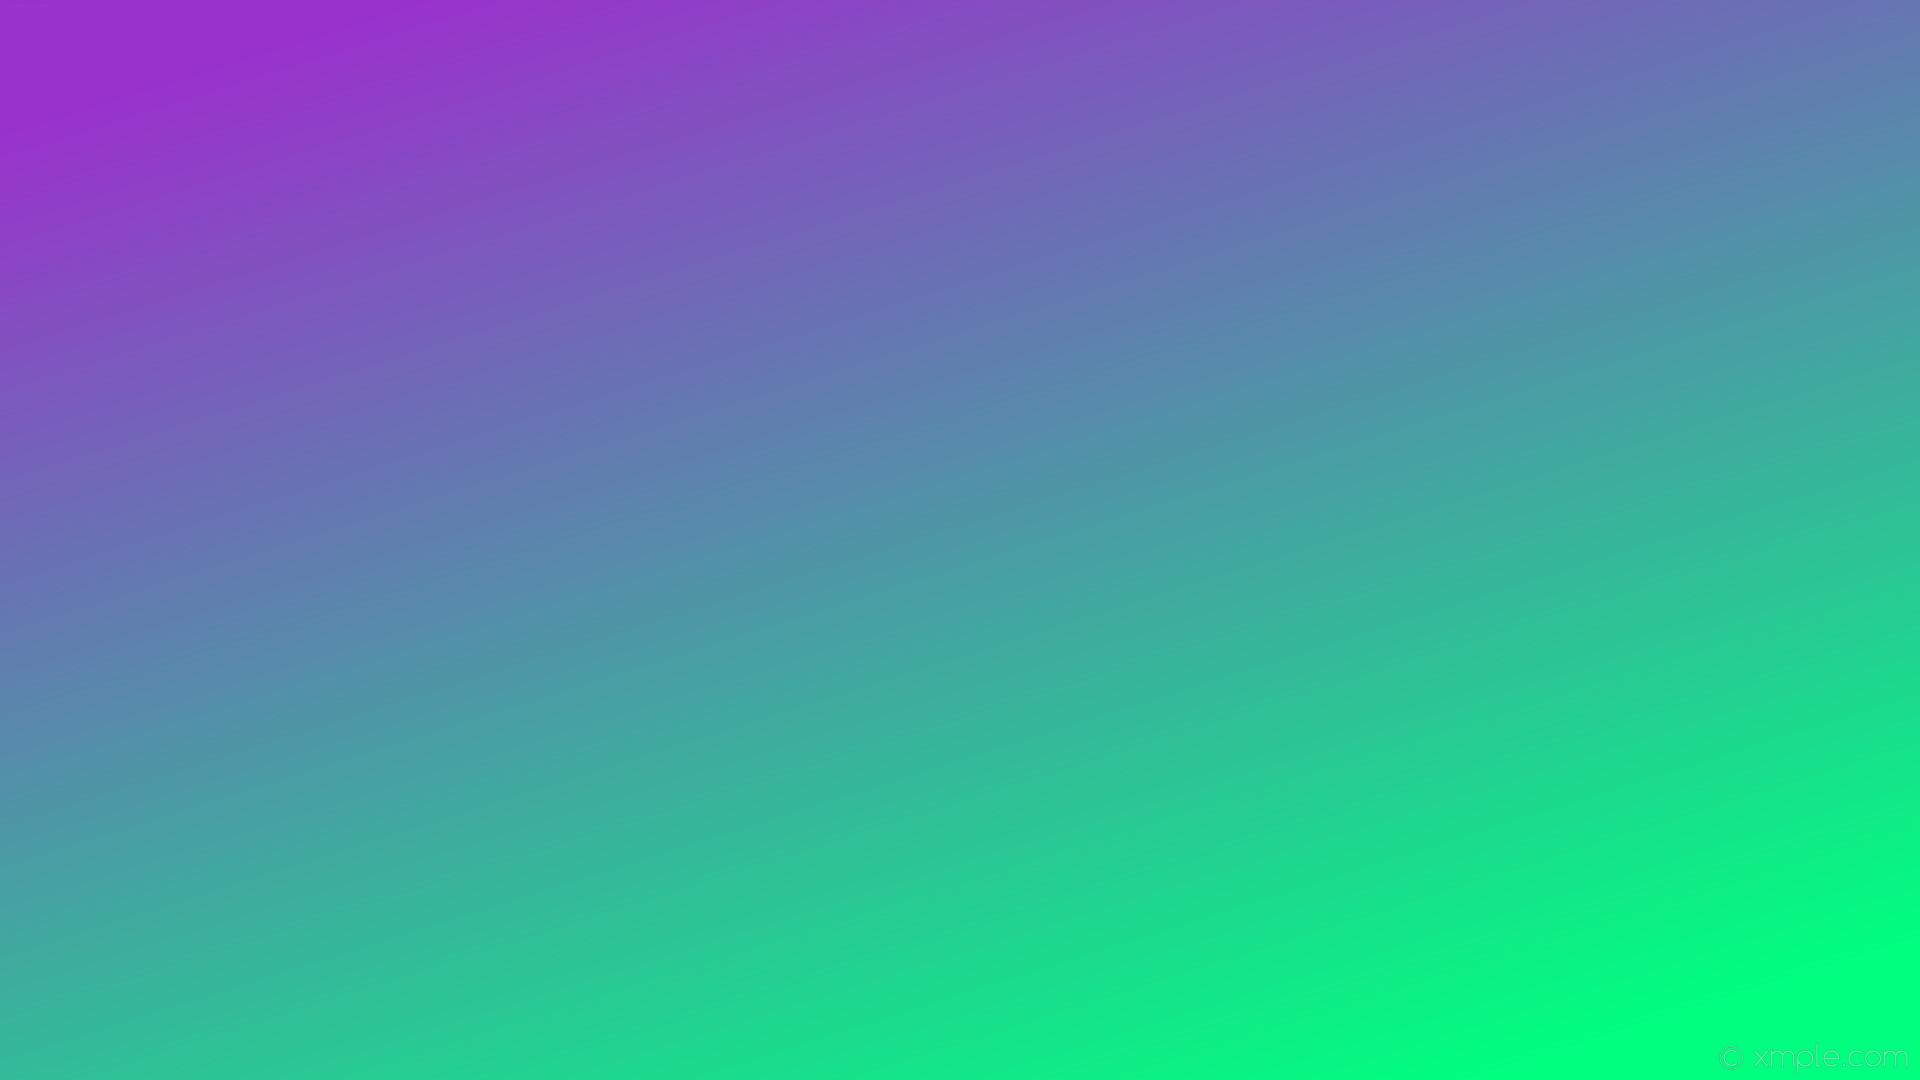 wallpaper green gradient linear purple spring green dark orchid #00ff7f  #9932cc 315°